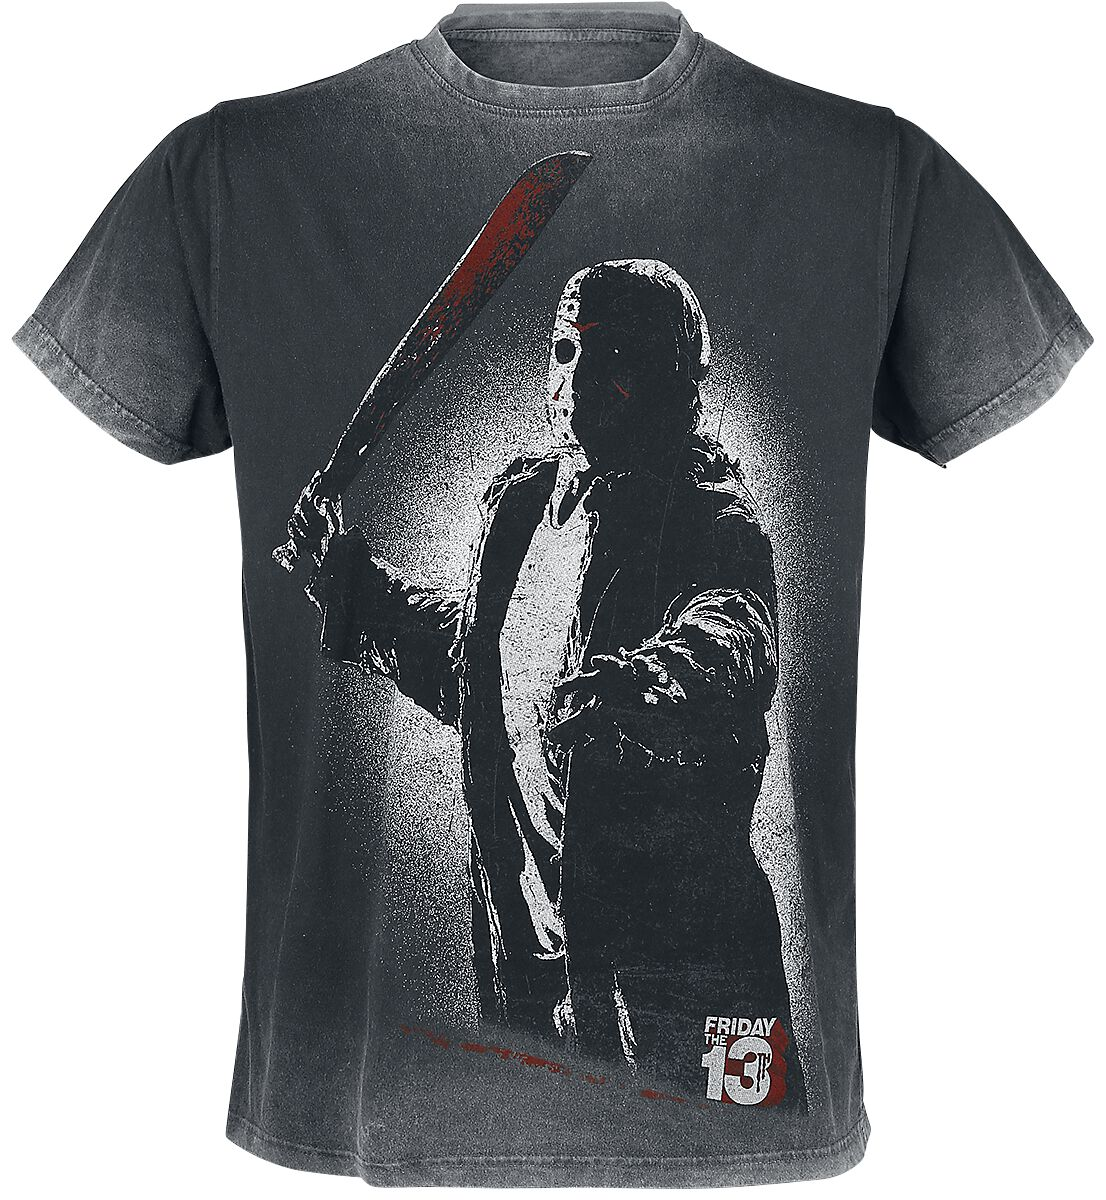 Merch dla Fanów - Koszulki - T-Shirt Friday The 13th Jason T-Shirt szary - 375310